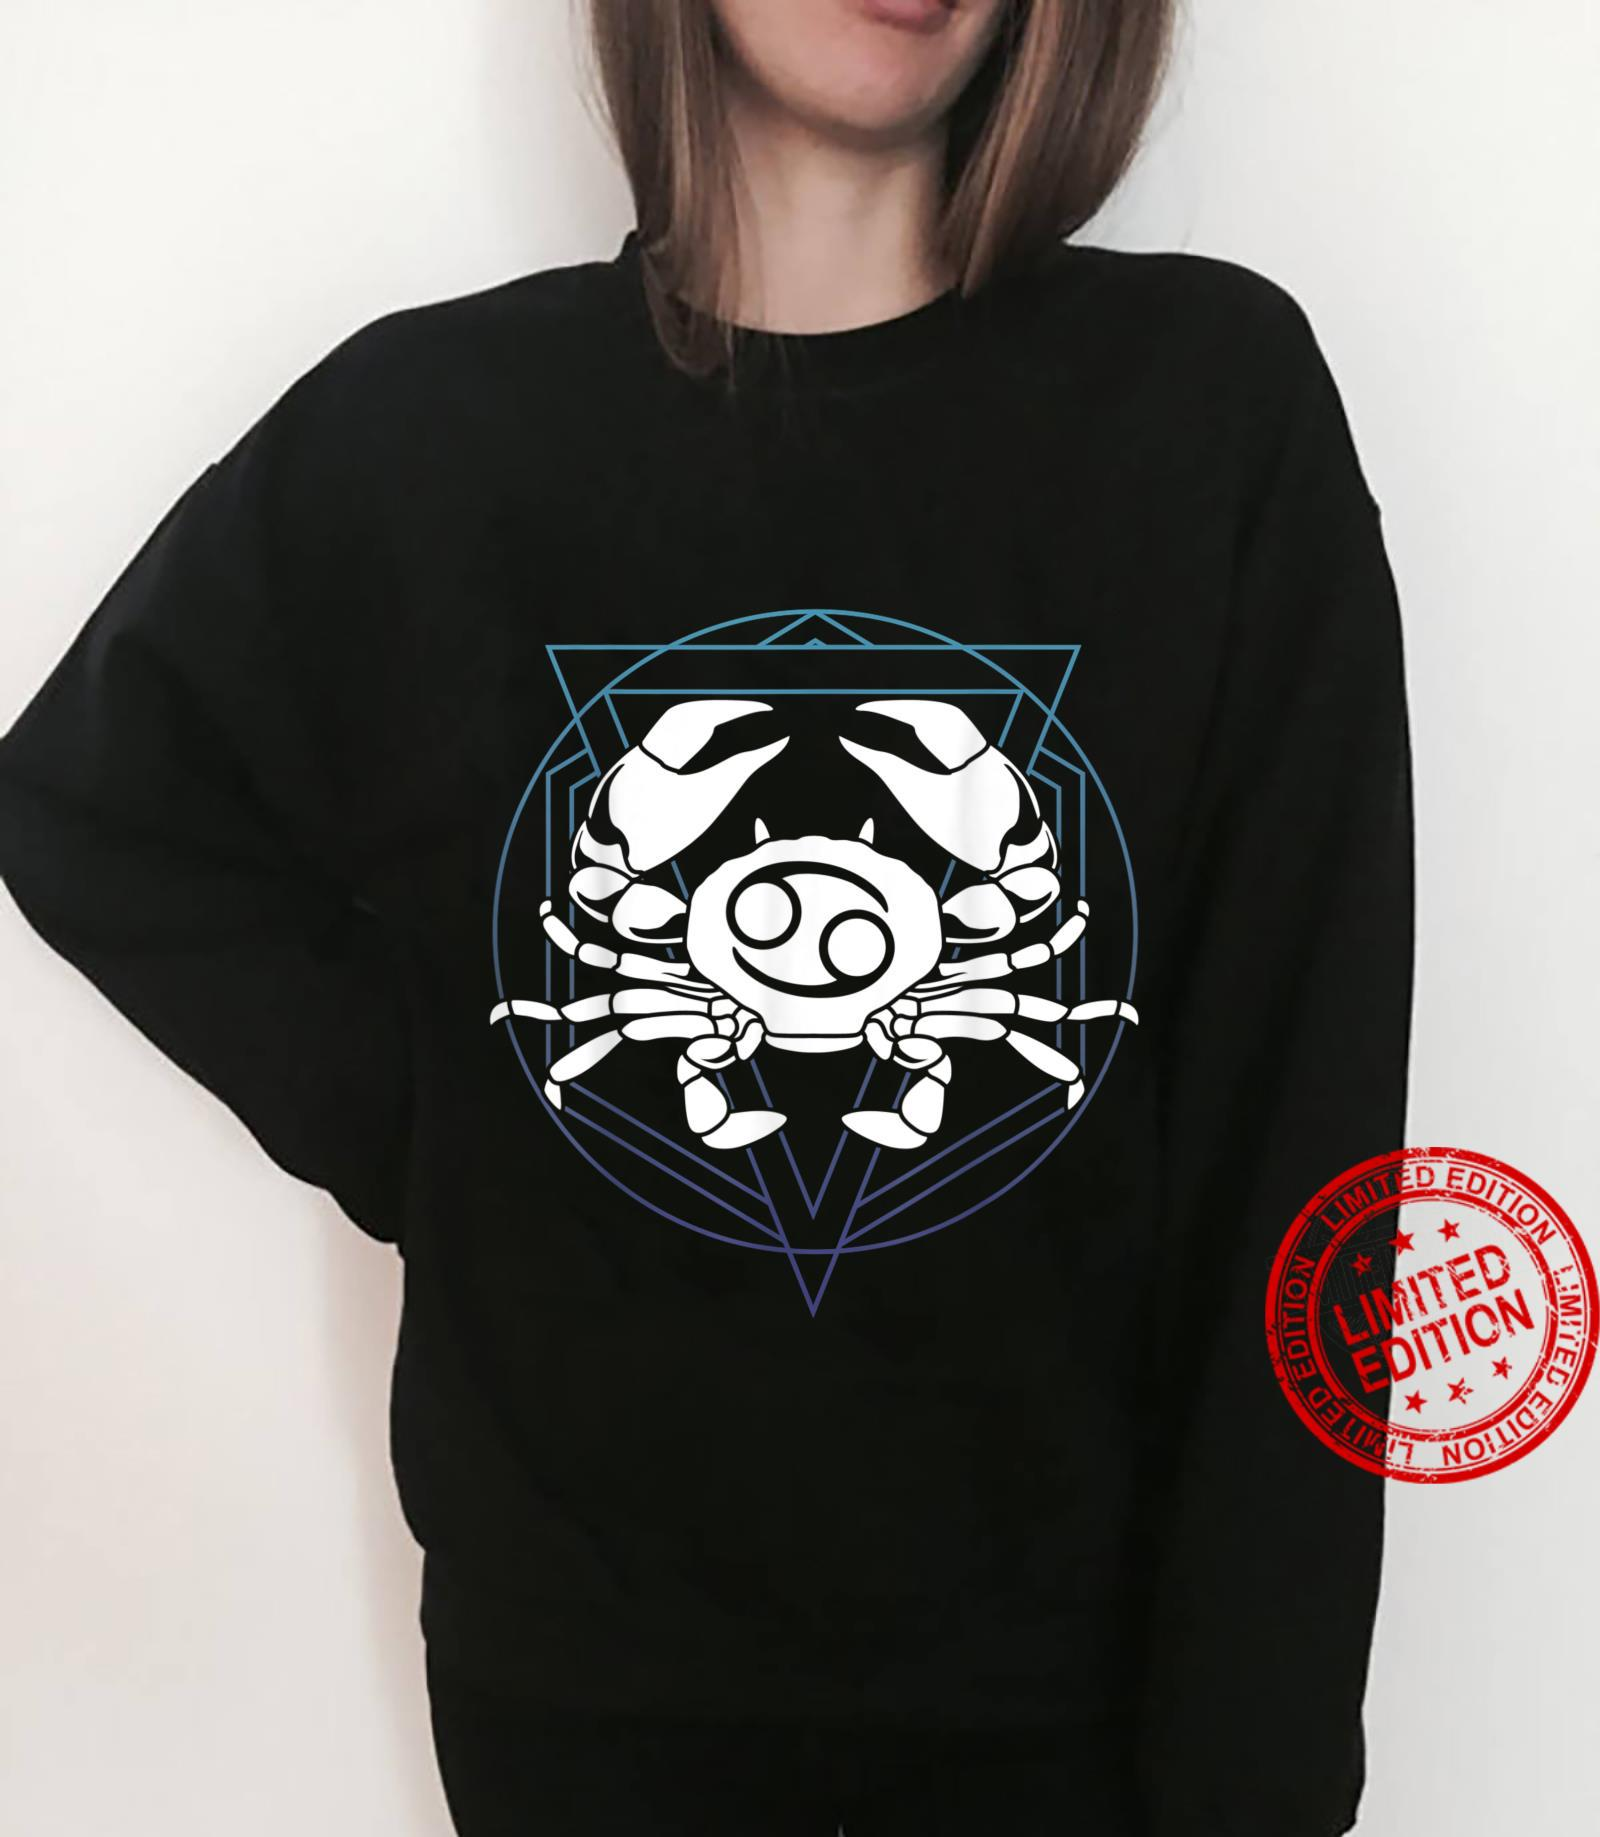 Zodiac Sign Horoscope Cancer Symbol Shirt sweater